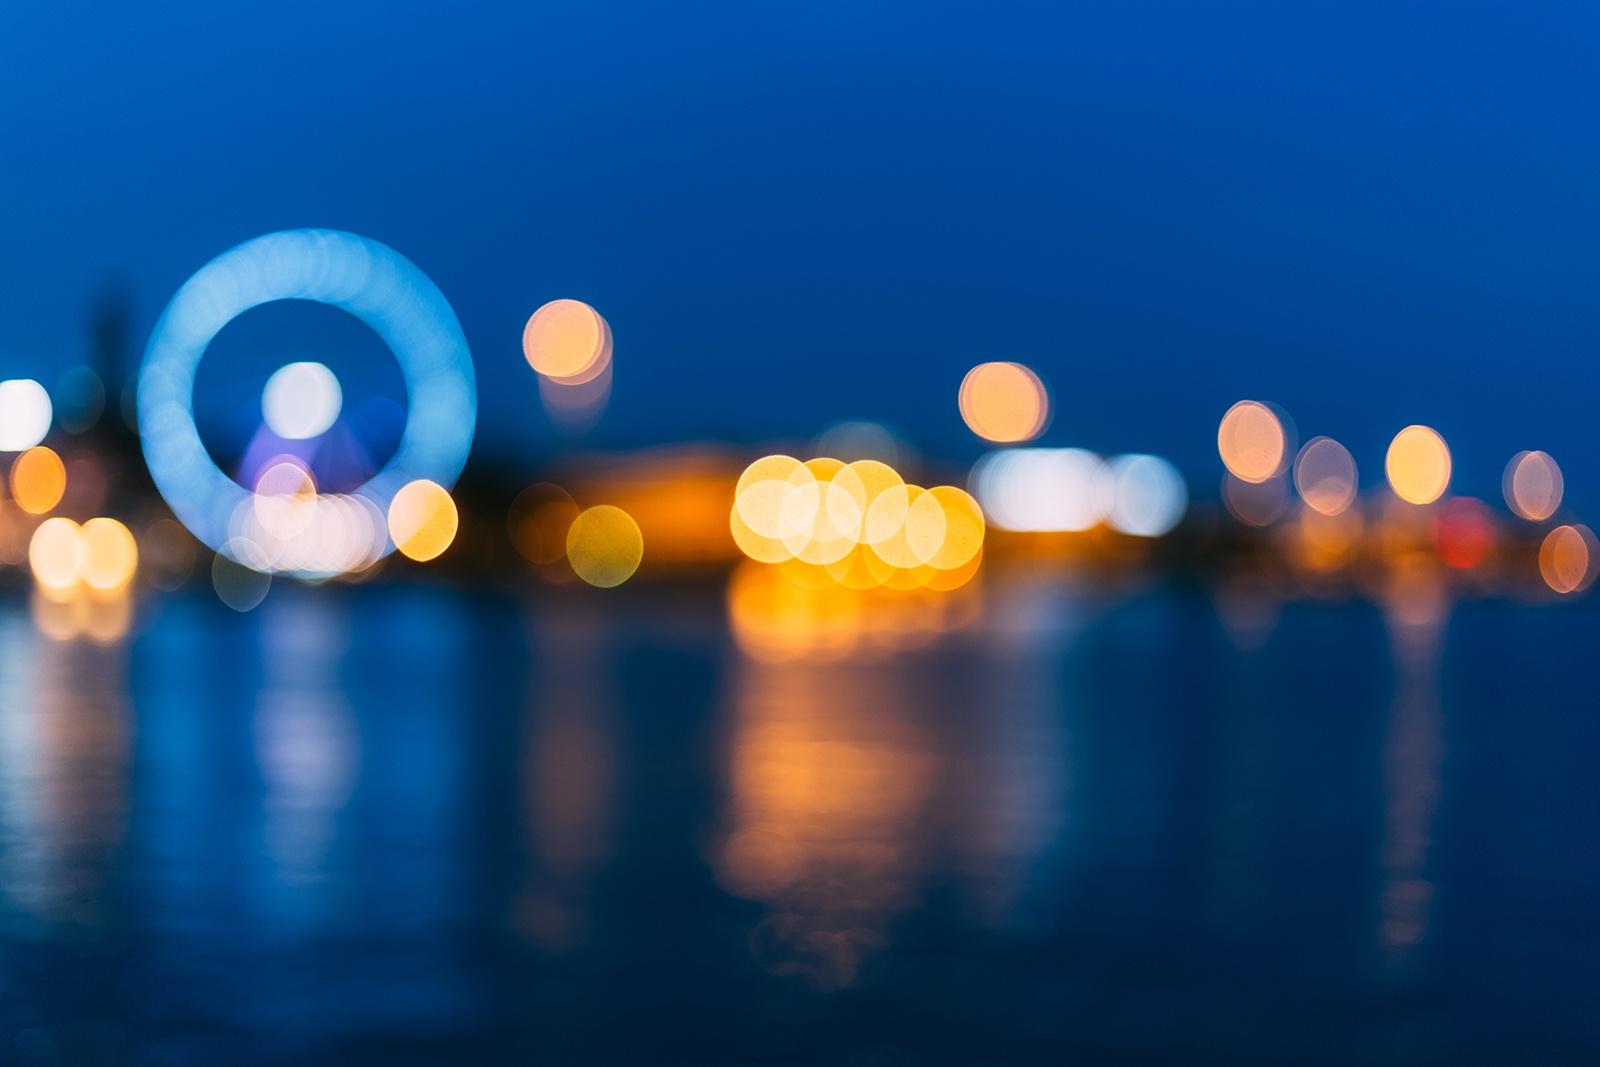 header-blur-night.jpg